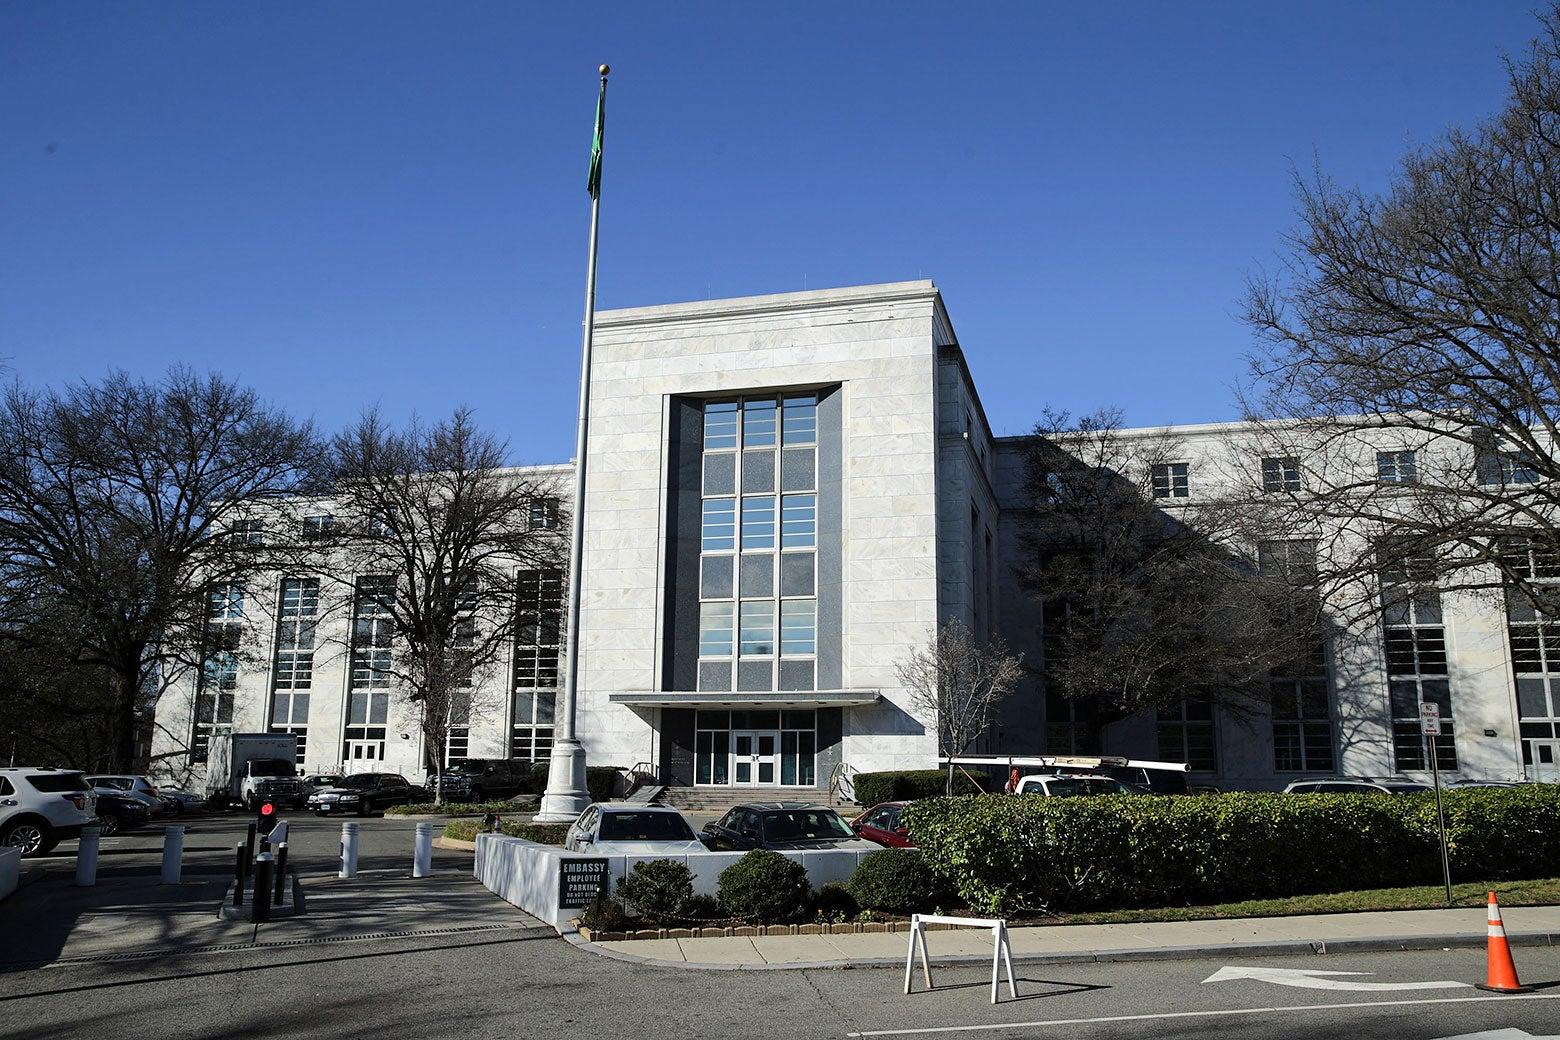 The Saudi Arabian Embassy in the United States